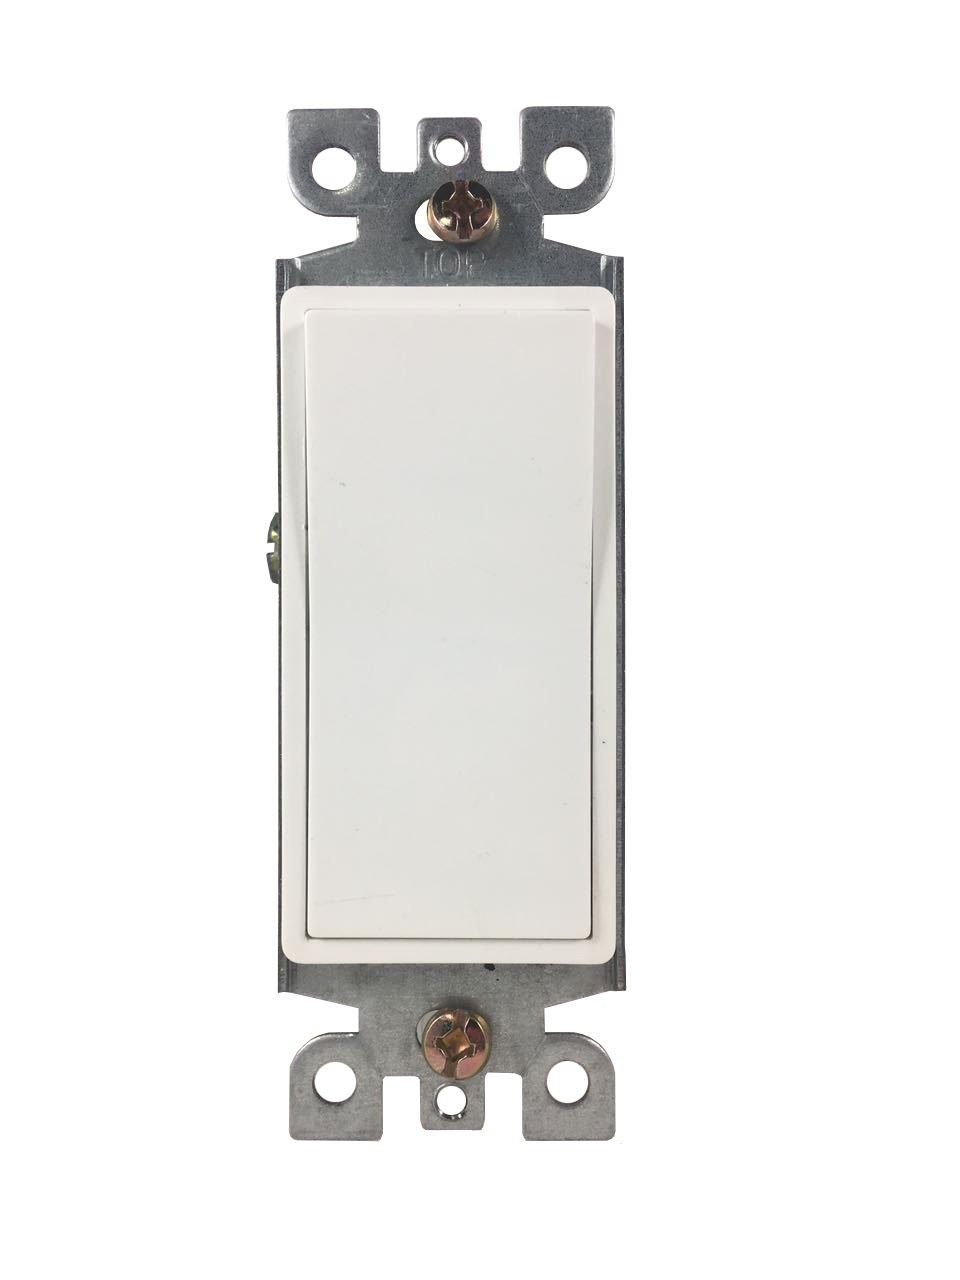 BYBON 15A Single Pole Decorative light Switch,White,UL Listed (10 Pack)